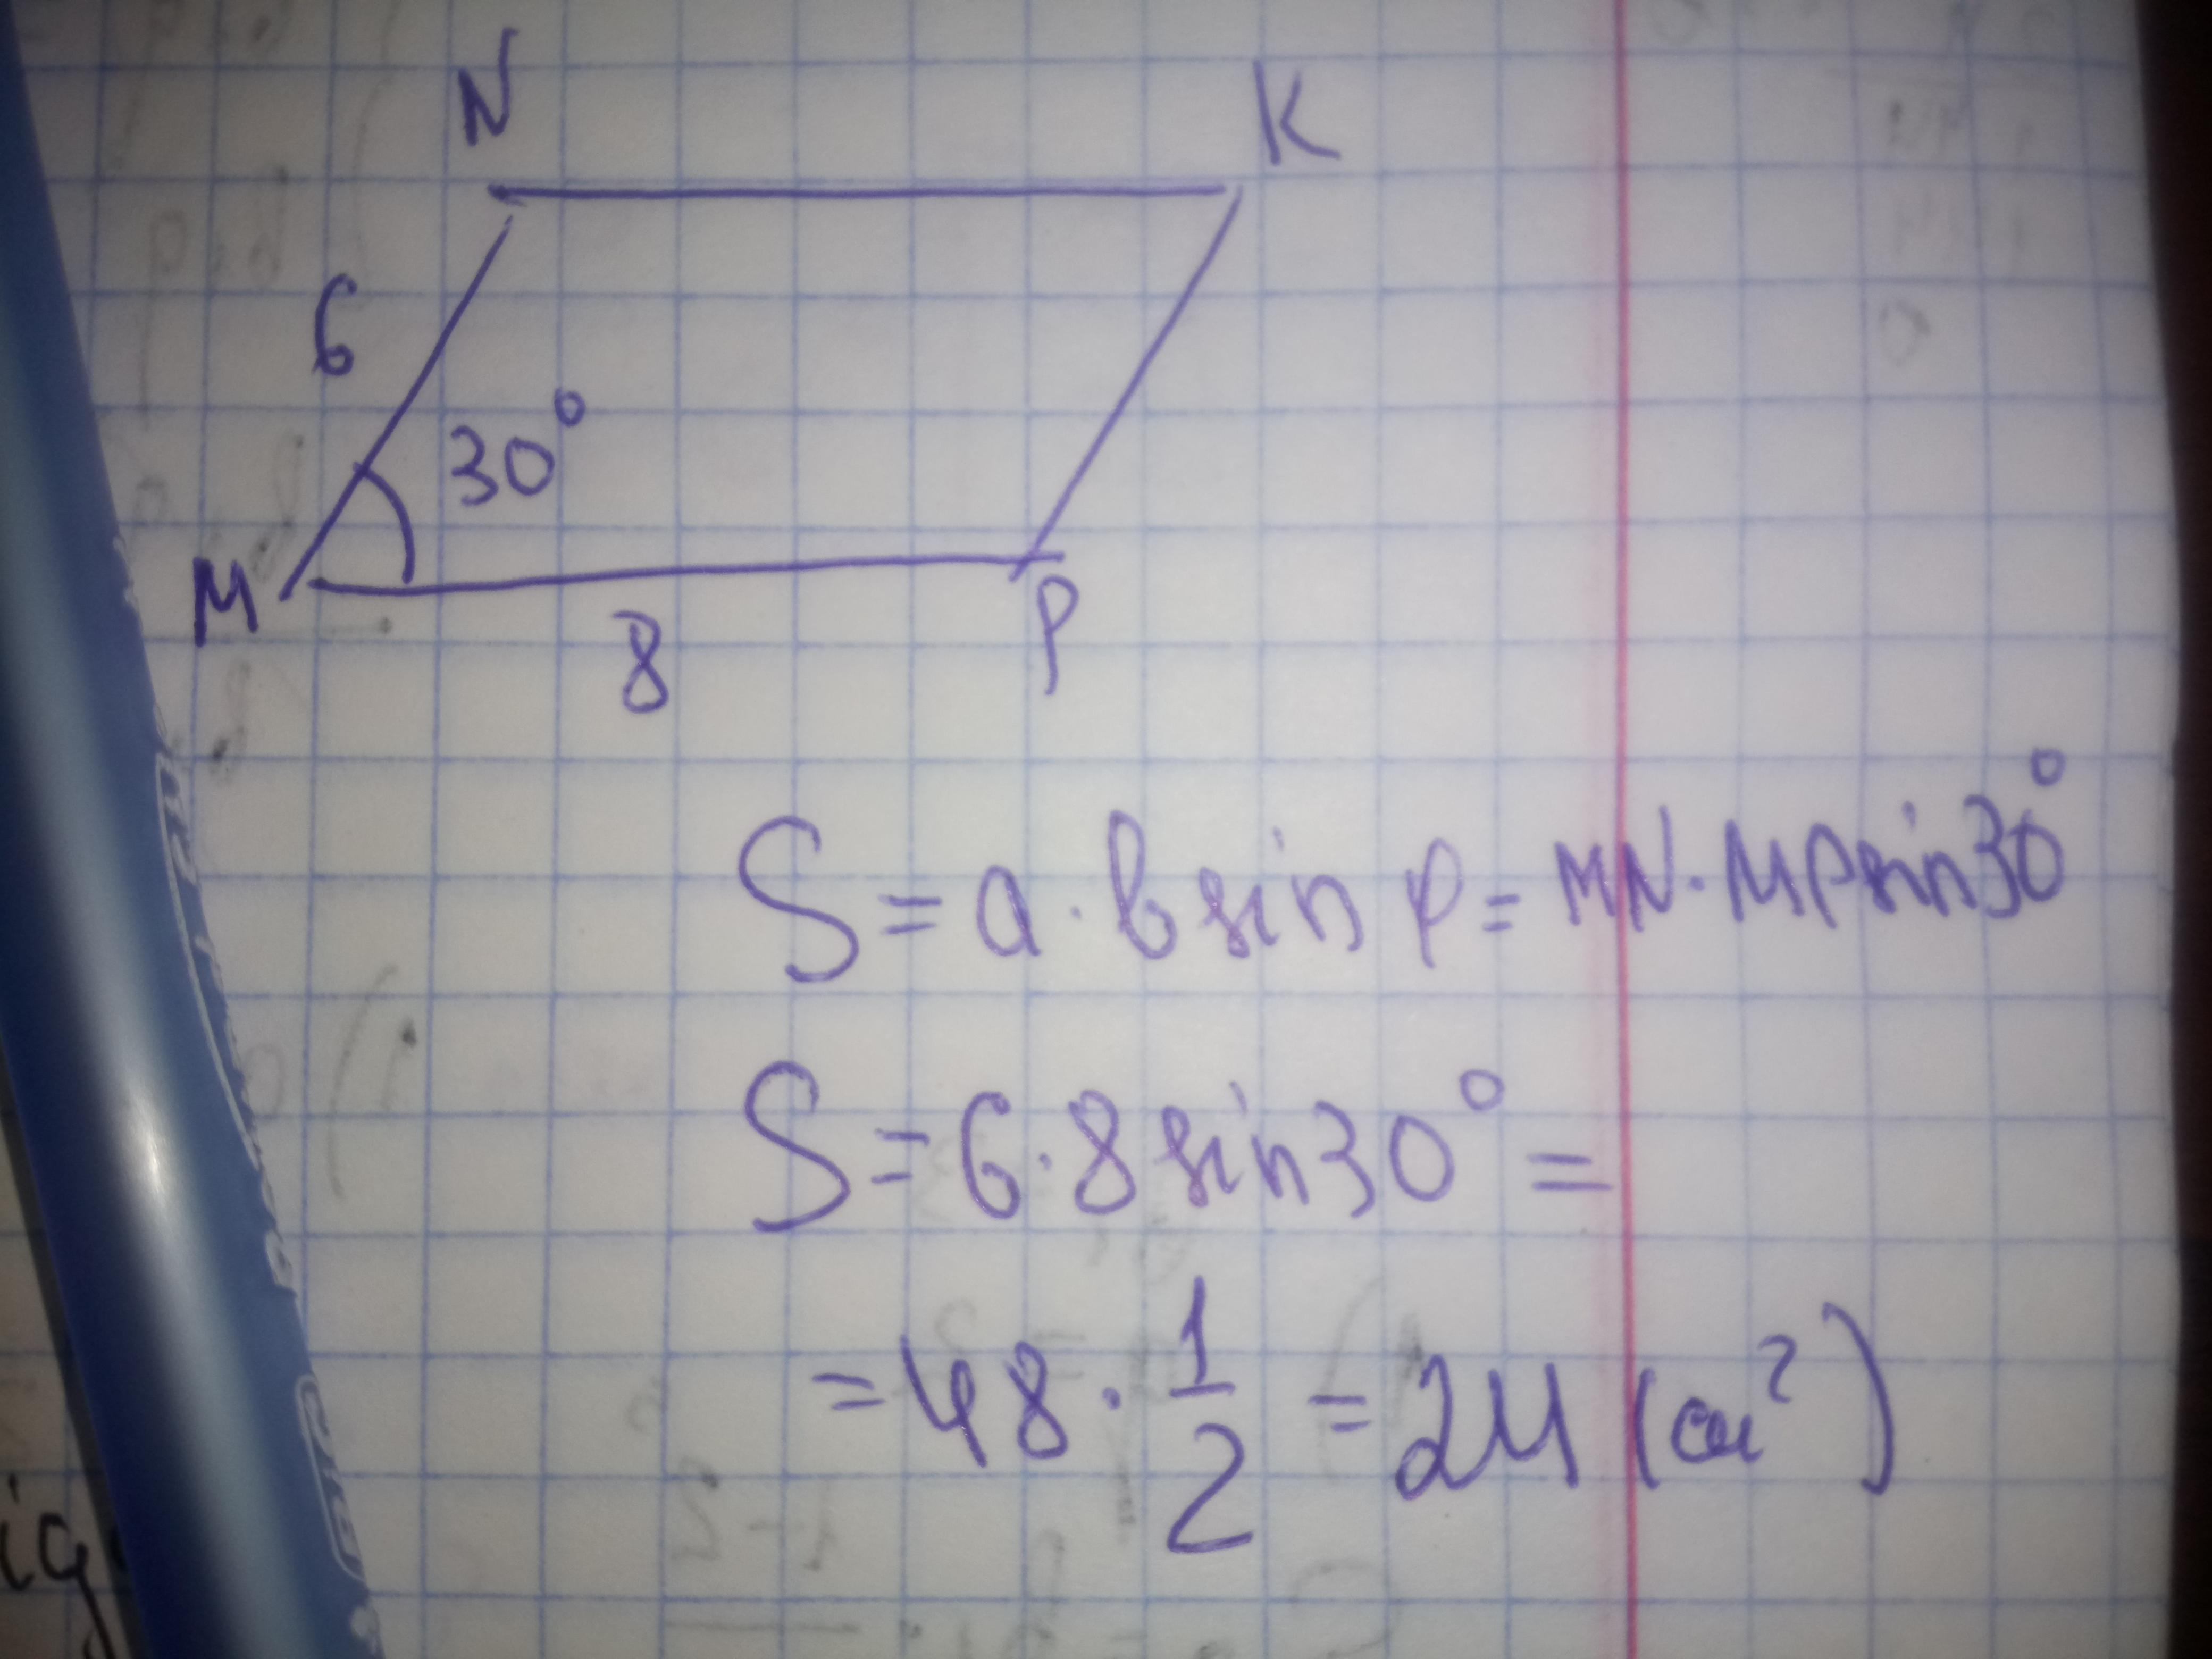 Найдите площадь параллелограмма MNKP, если его две